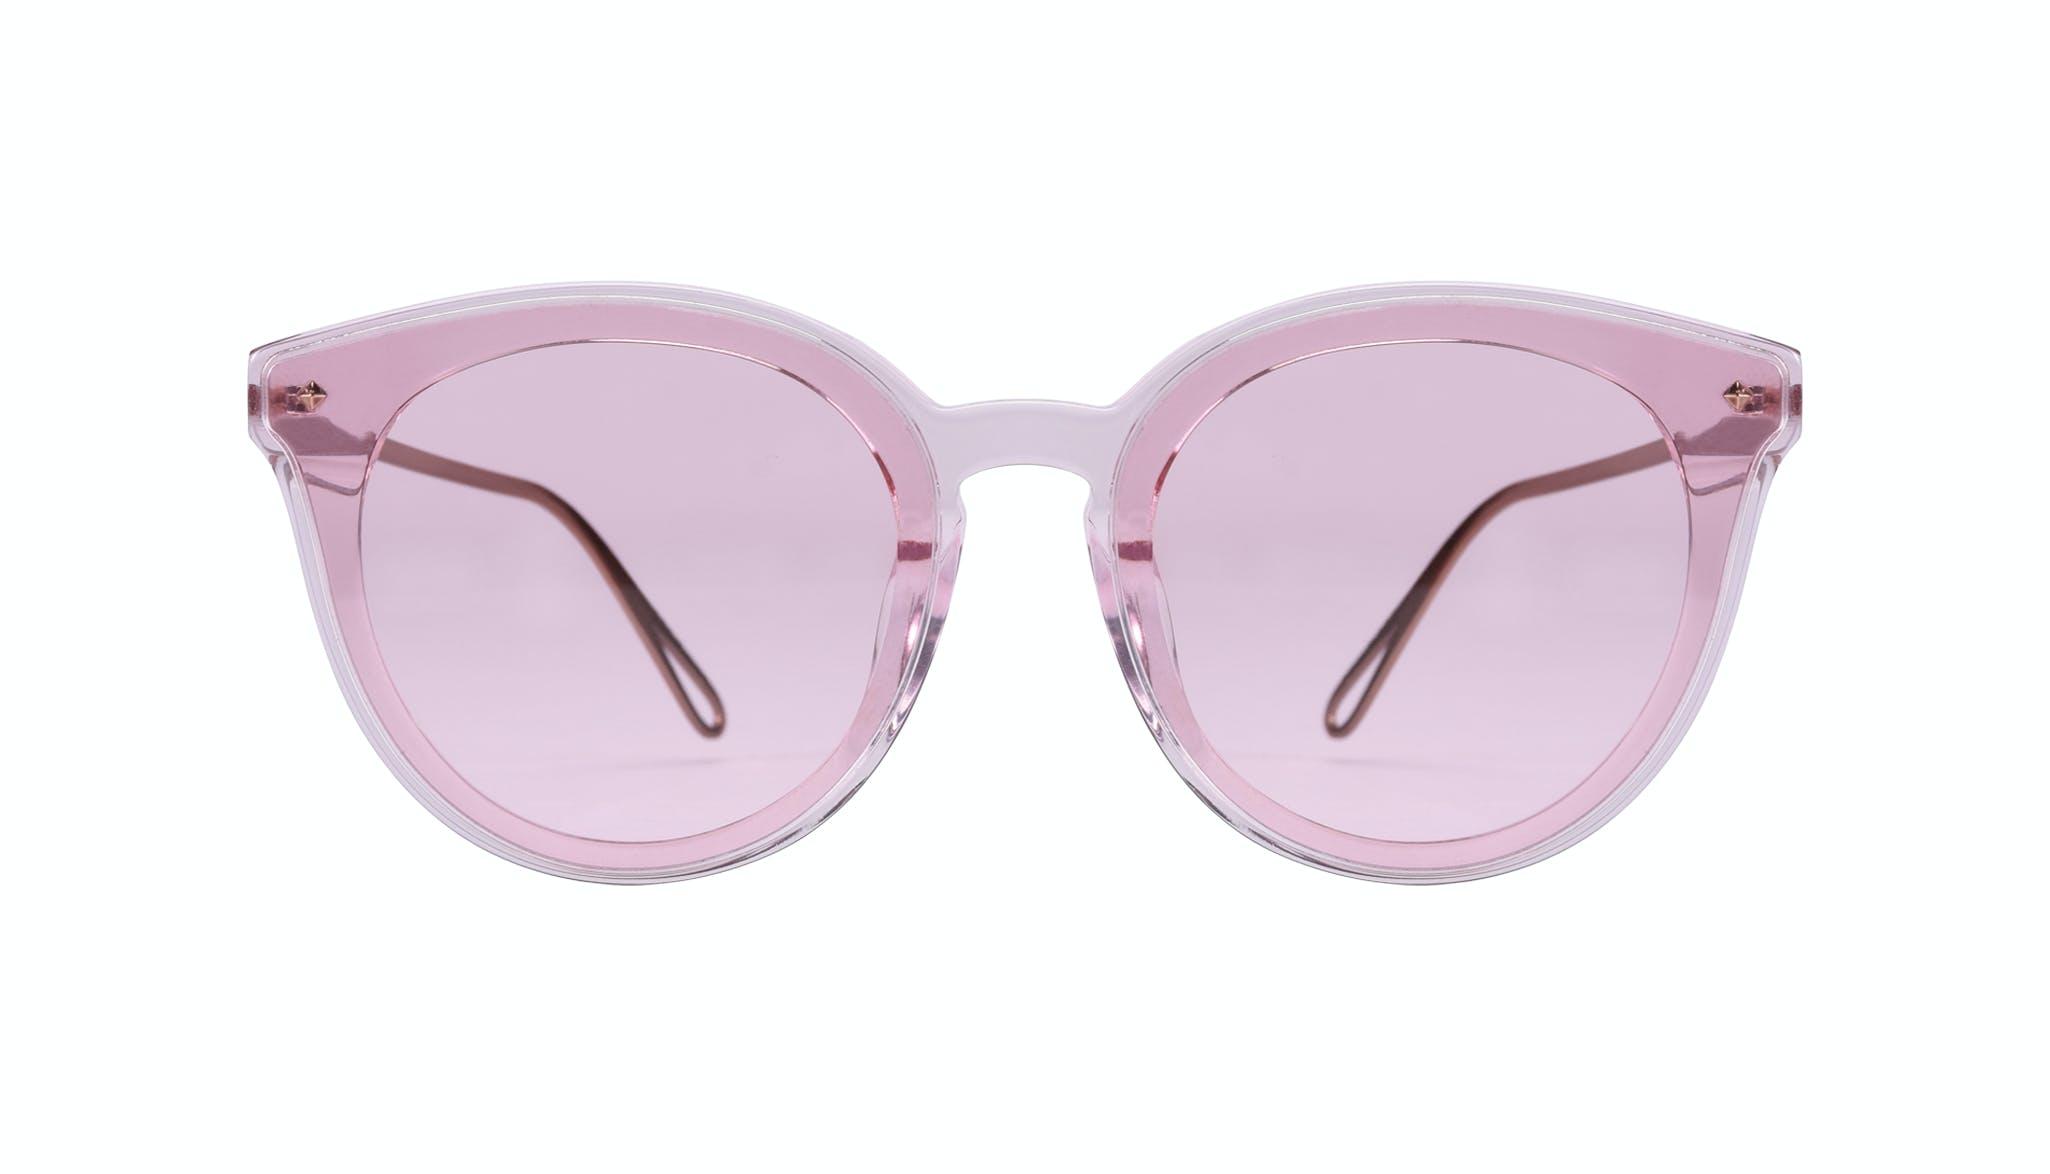 Affordable Fashion Glasses Cat Eye Sunglasses Women Icone Rose